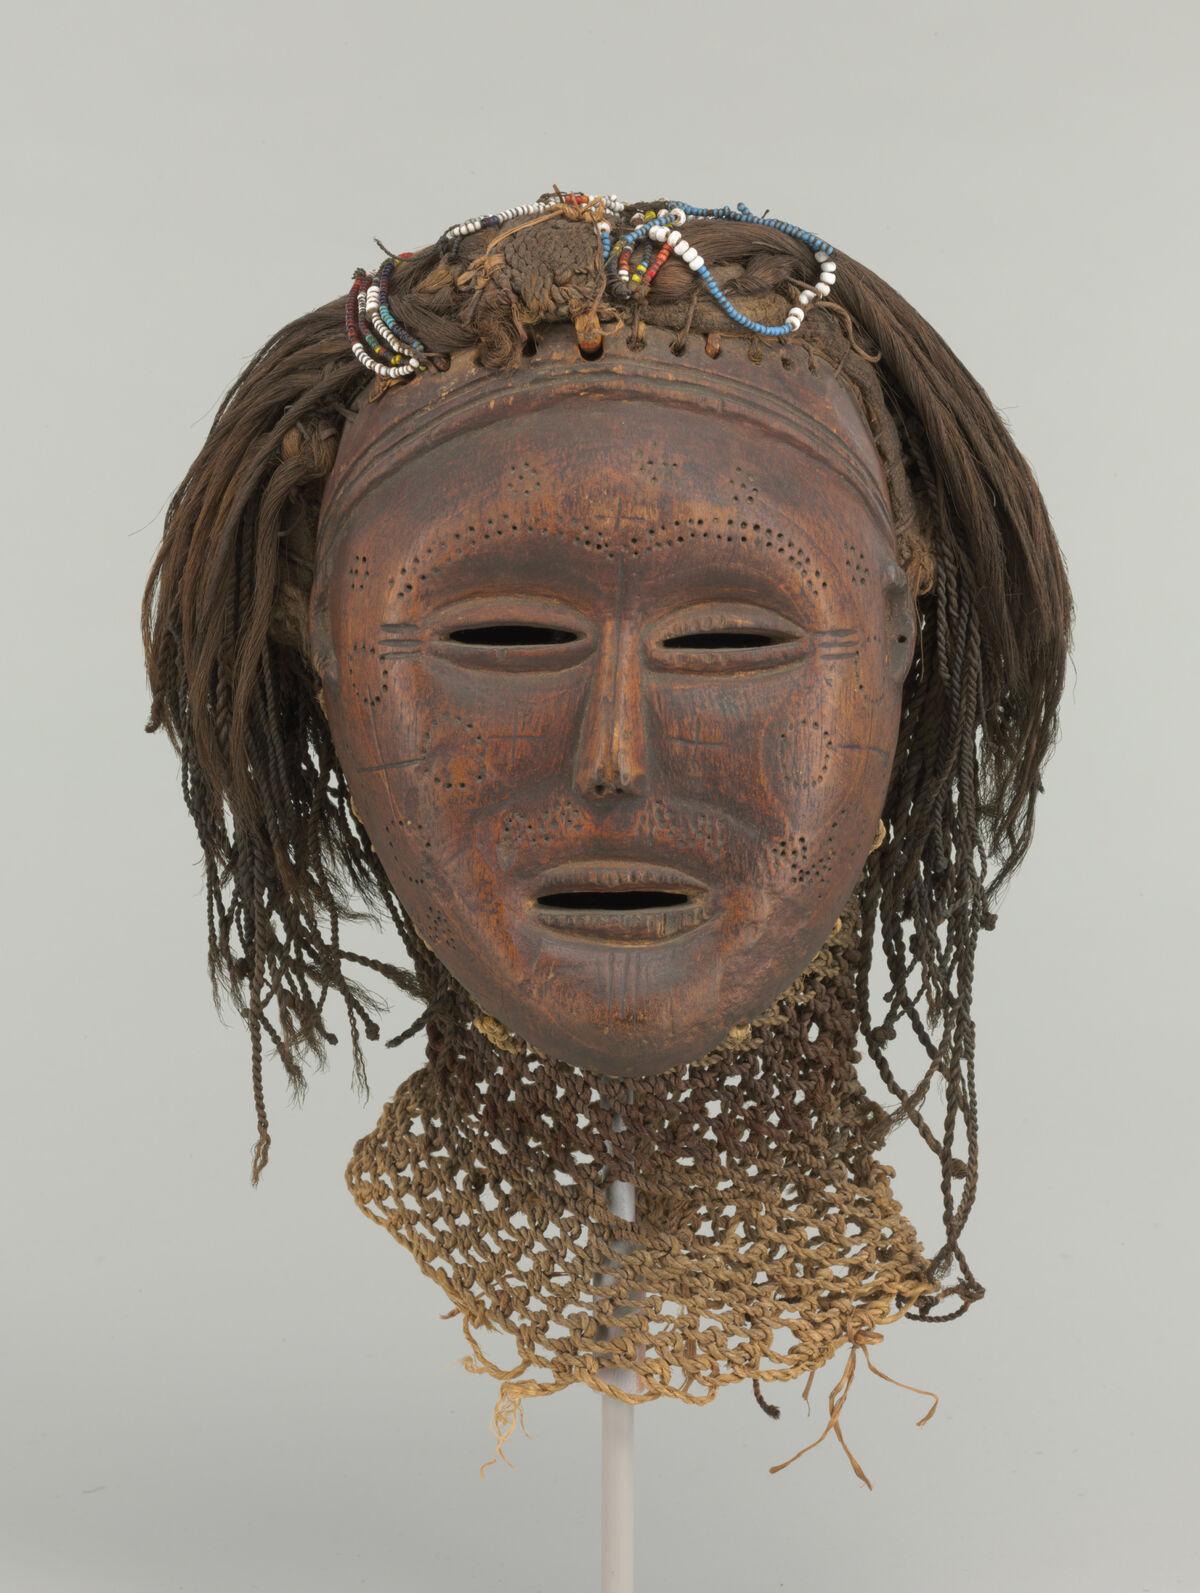 Unidentified artist from the Lwena region, Angol, Mask (Mwana wa Pwevo), early 20th century. Courtesy of The Baltimore Museum of Art.